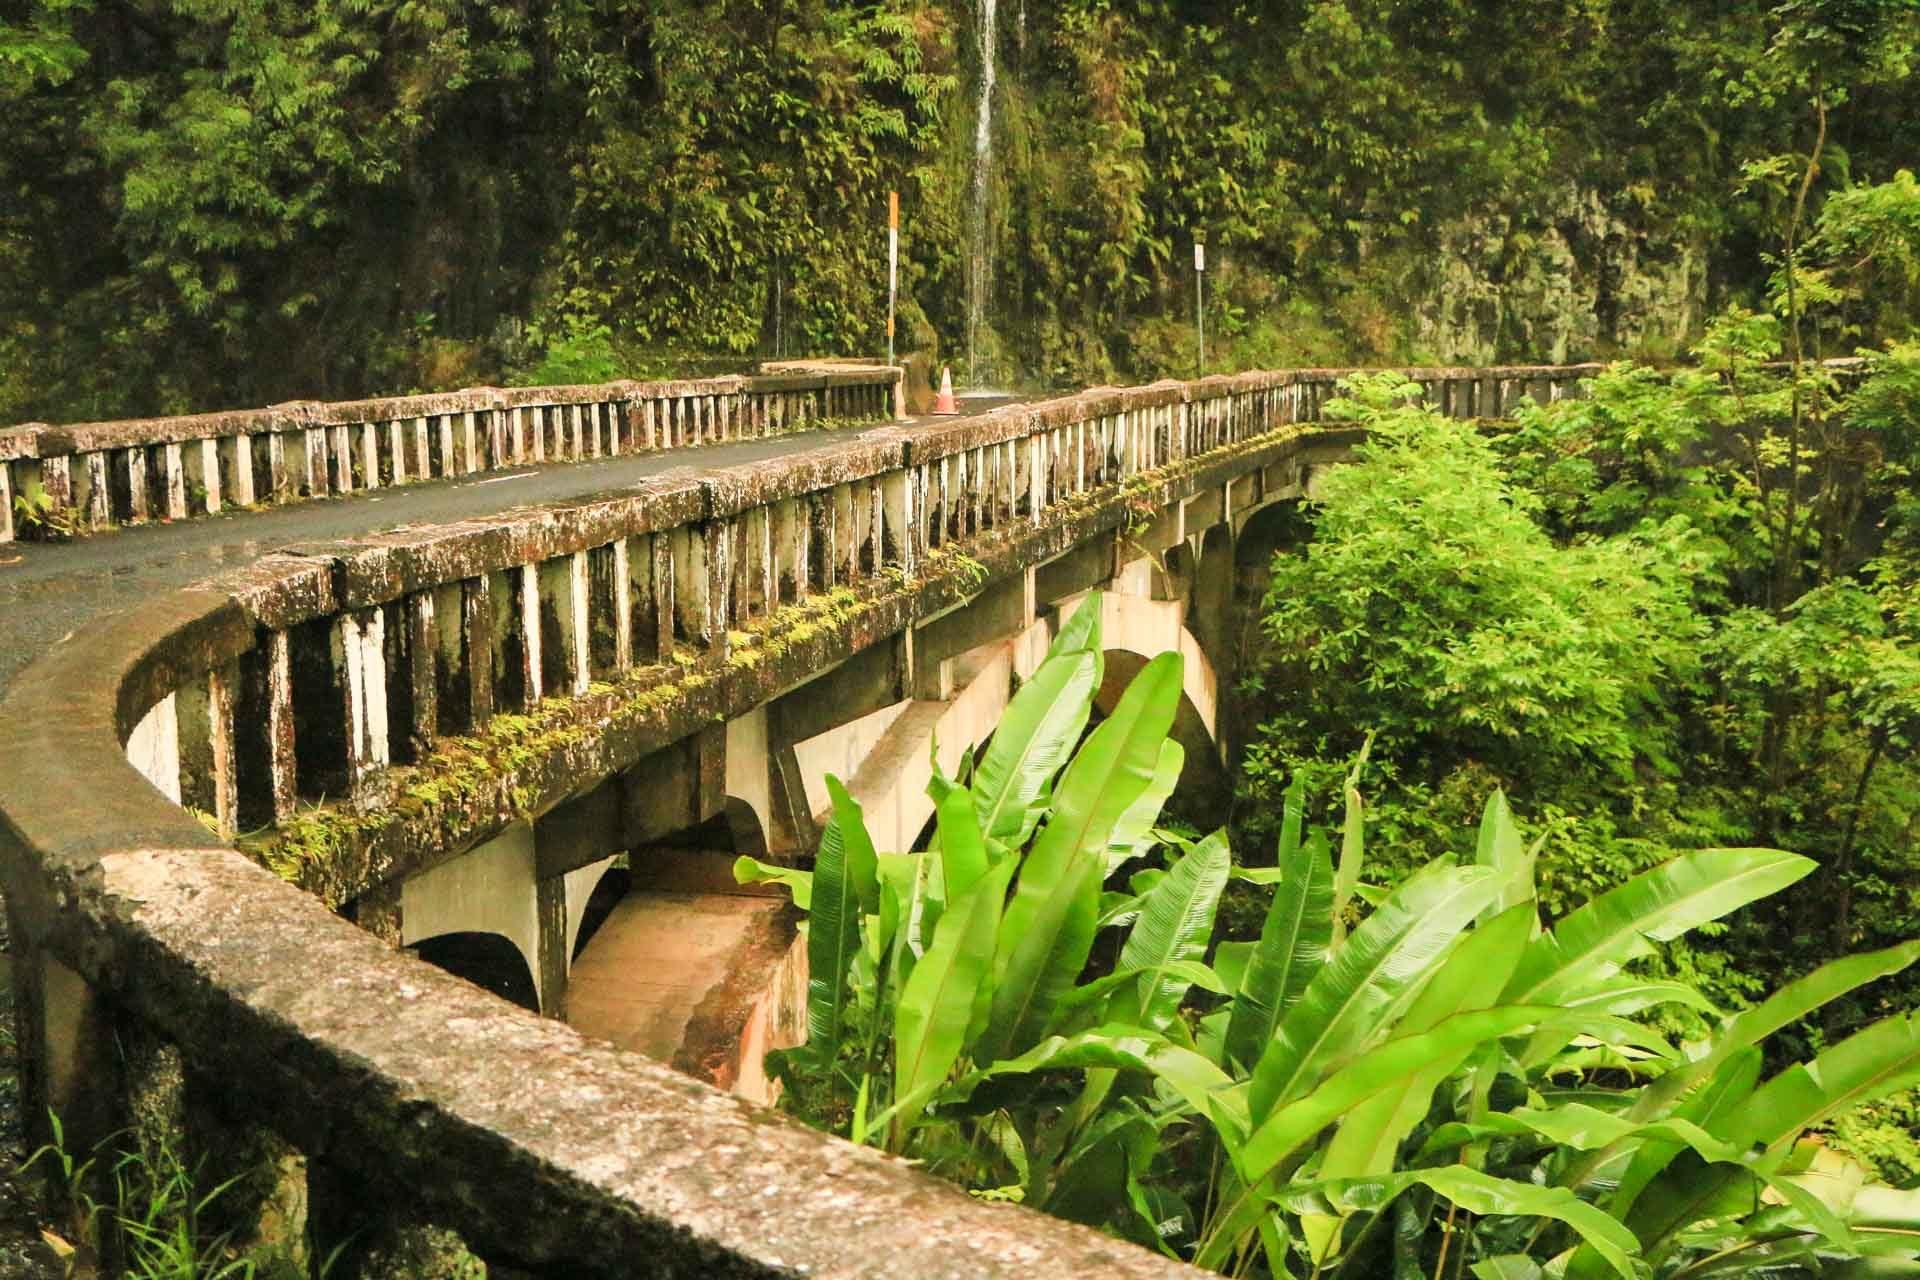 Road to Hana - Tours, Tips & Map